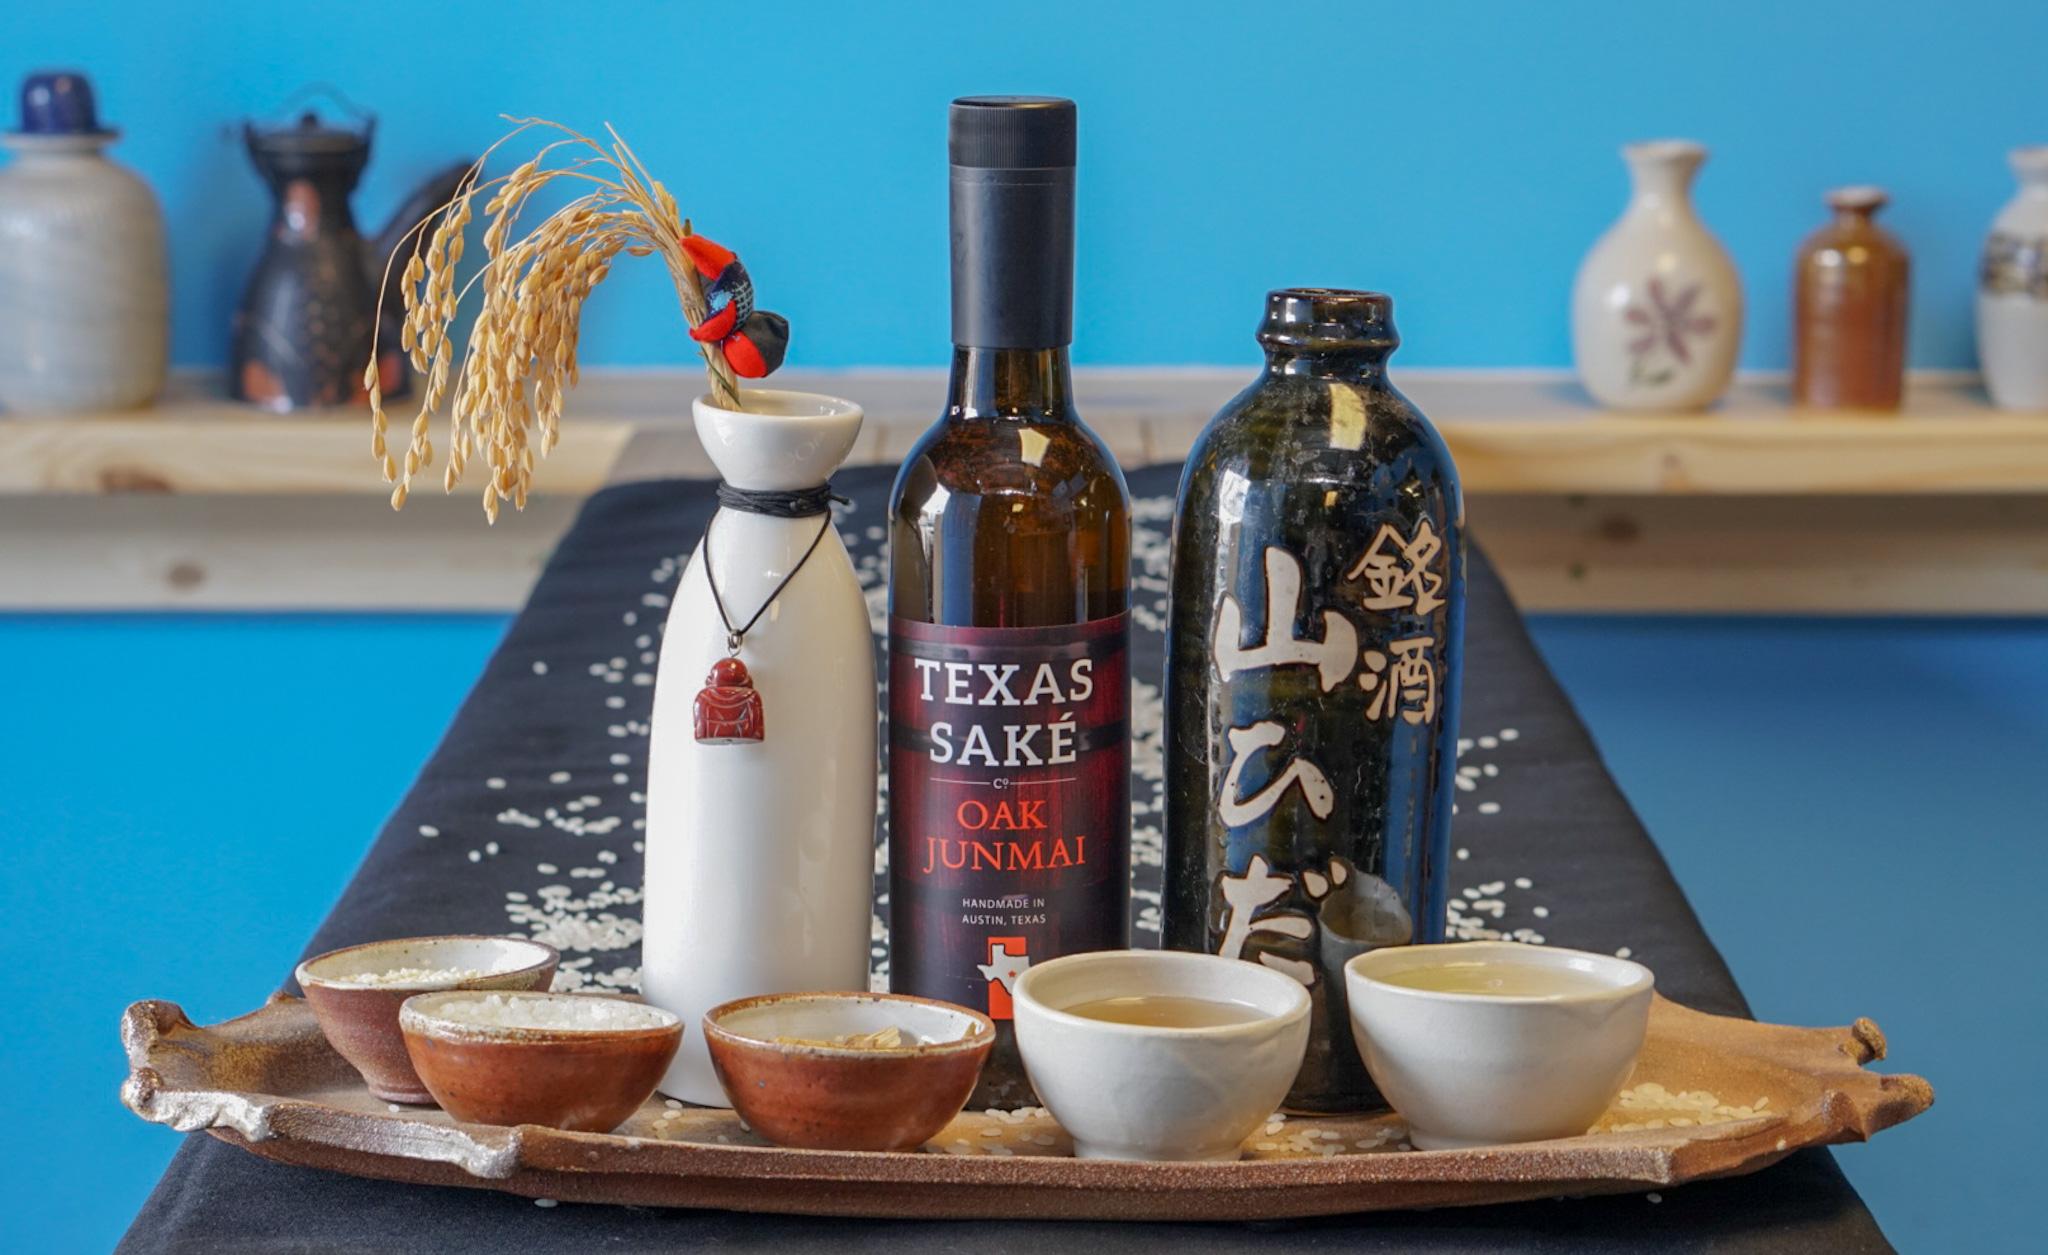 Top Austin Brewery - Texas Sake